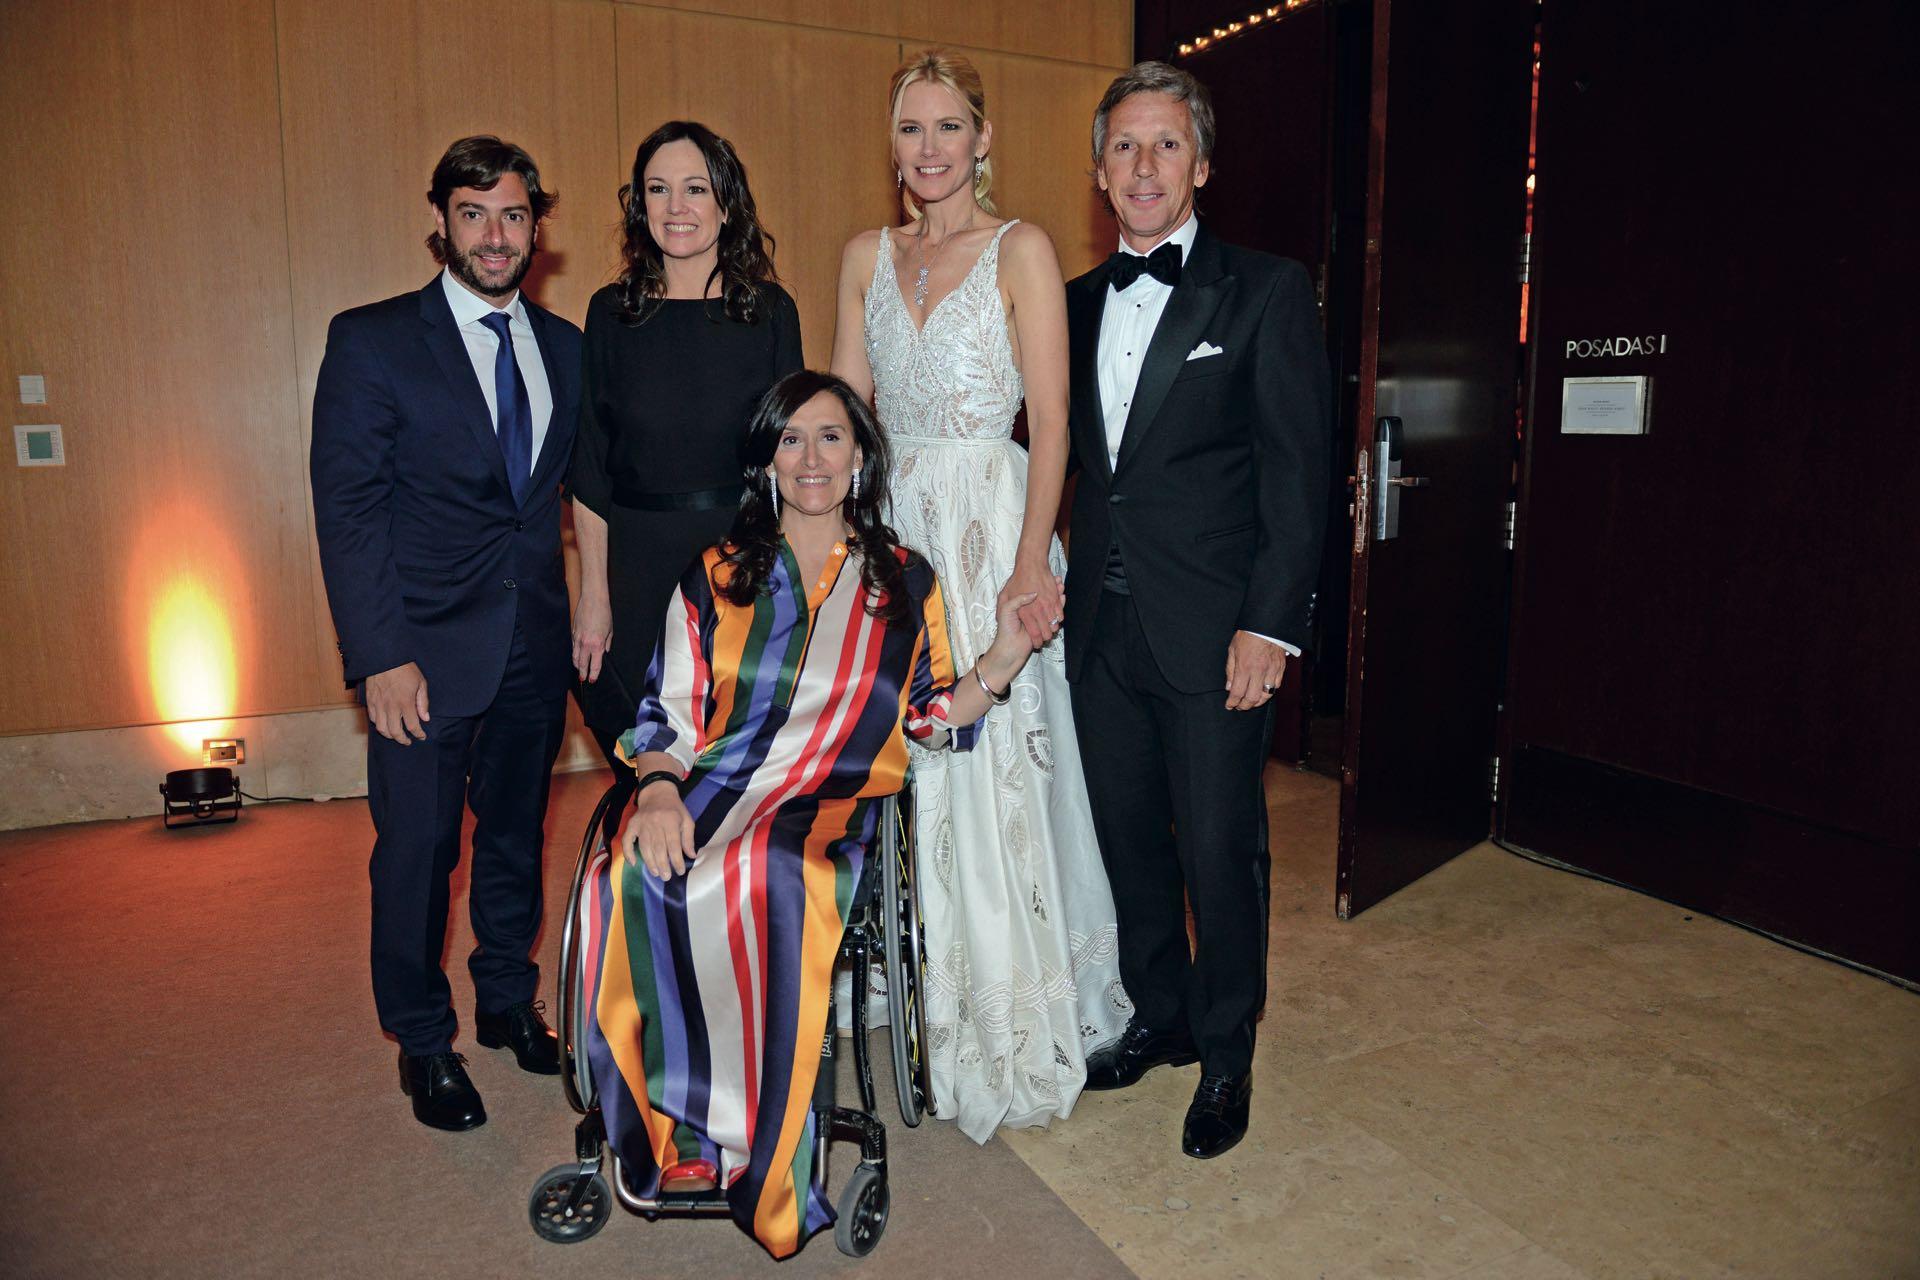 Federico Salví, Carolina Stanley y Grabriela Michetti posan junto a los anfitriones.